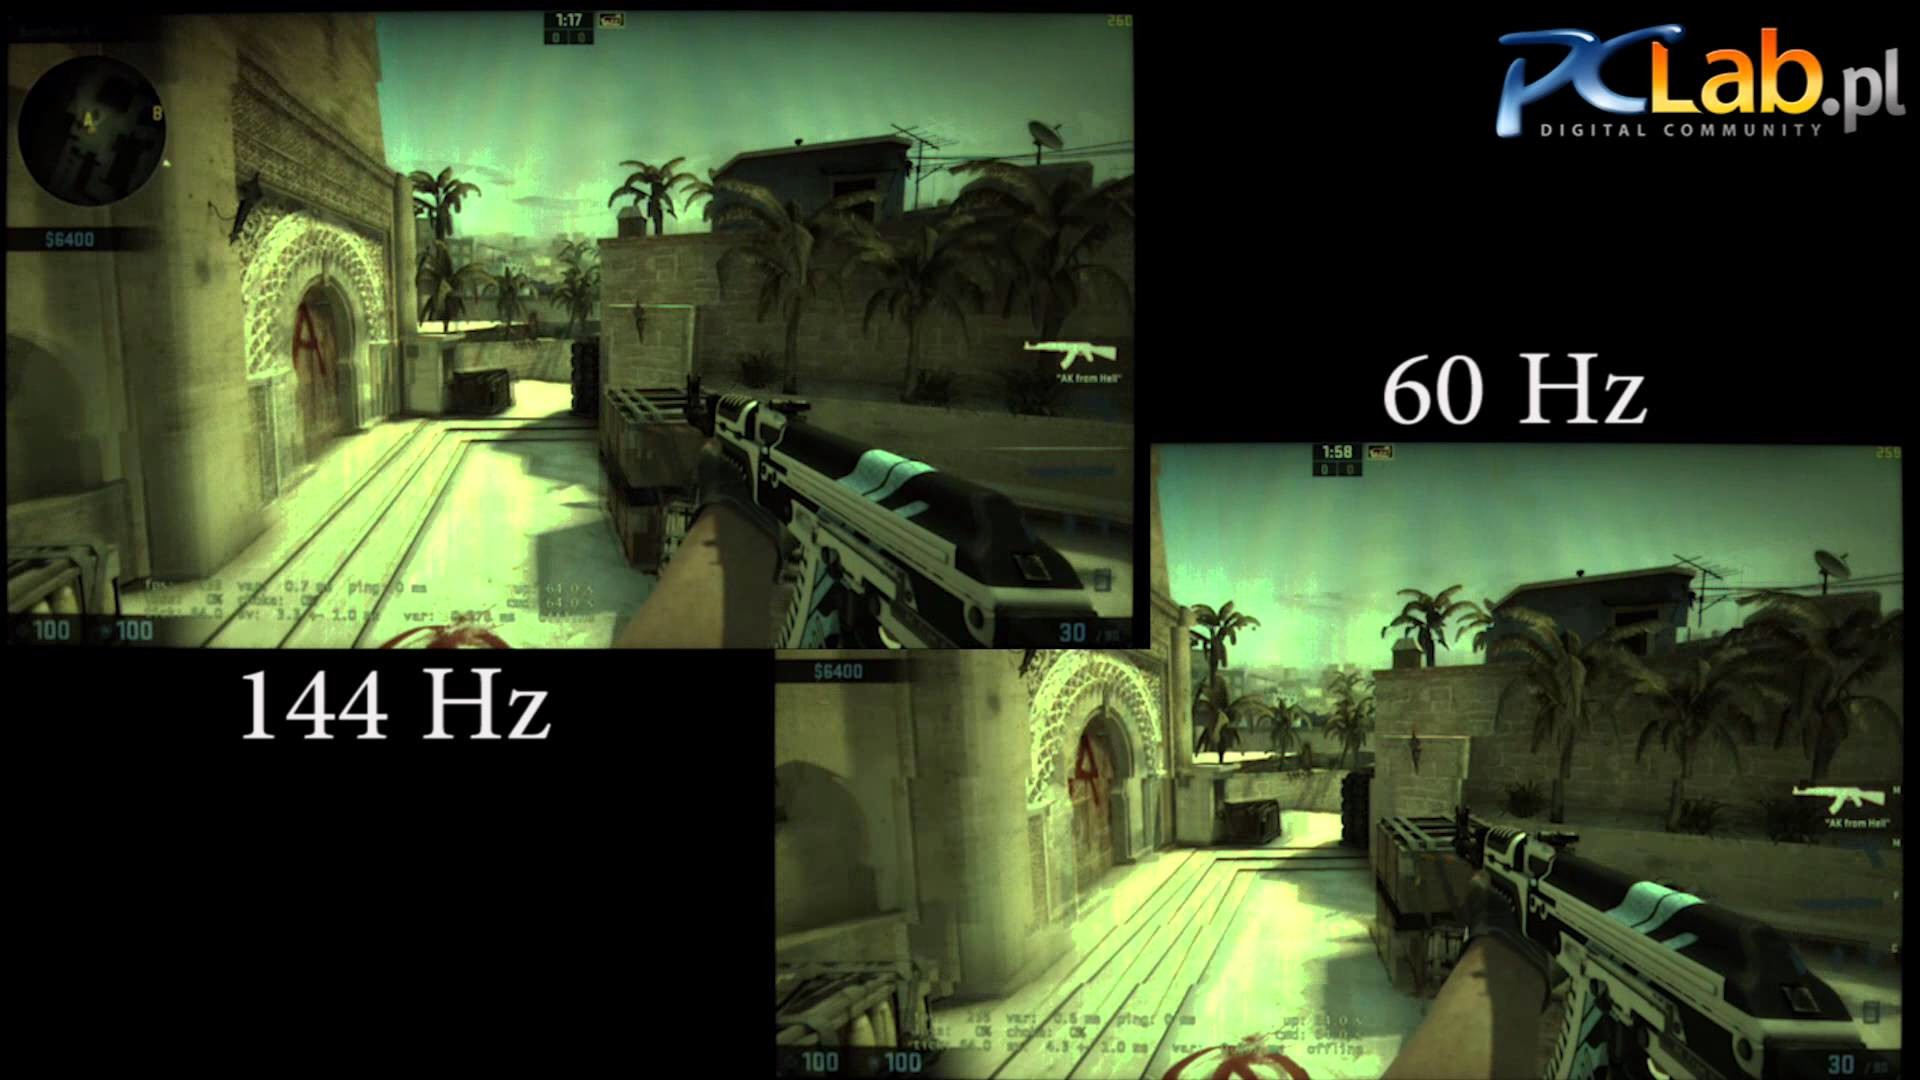 144 Hz vs 60 Hz in Counter-Strike: Global Offensive (Asus PG278Q) – YouTube